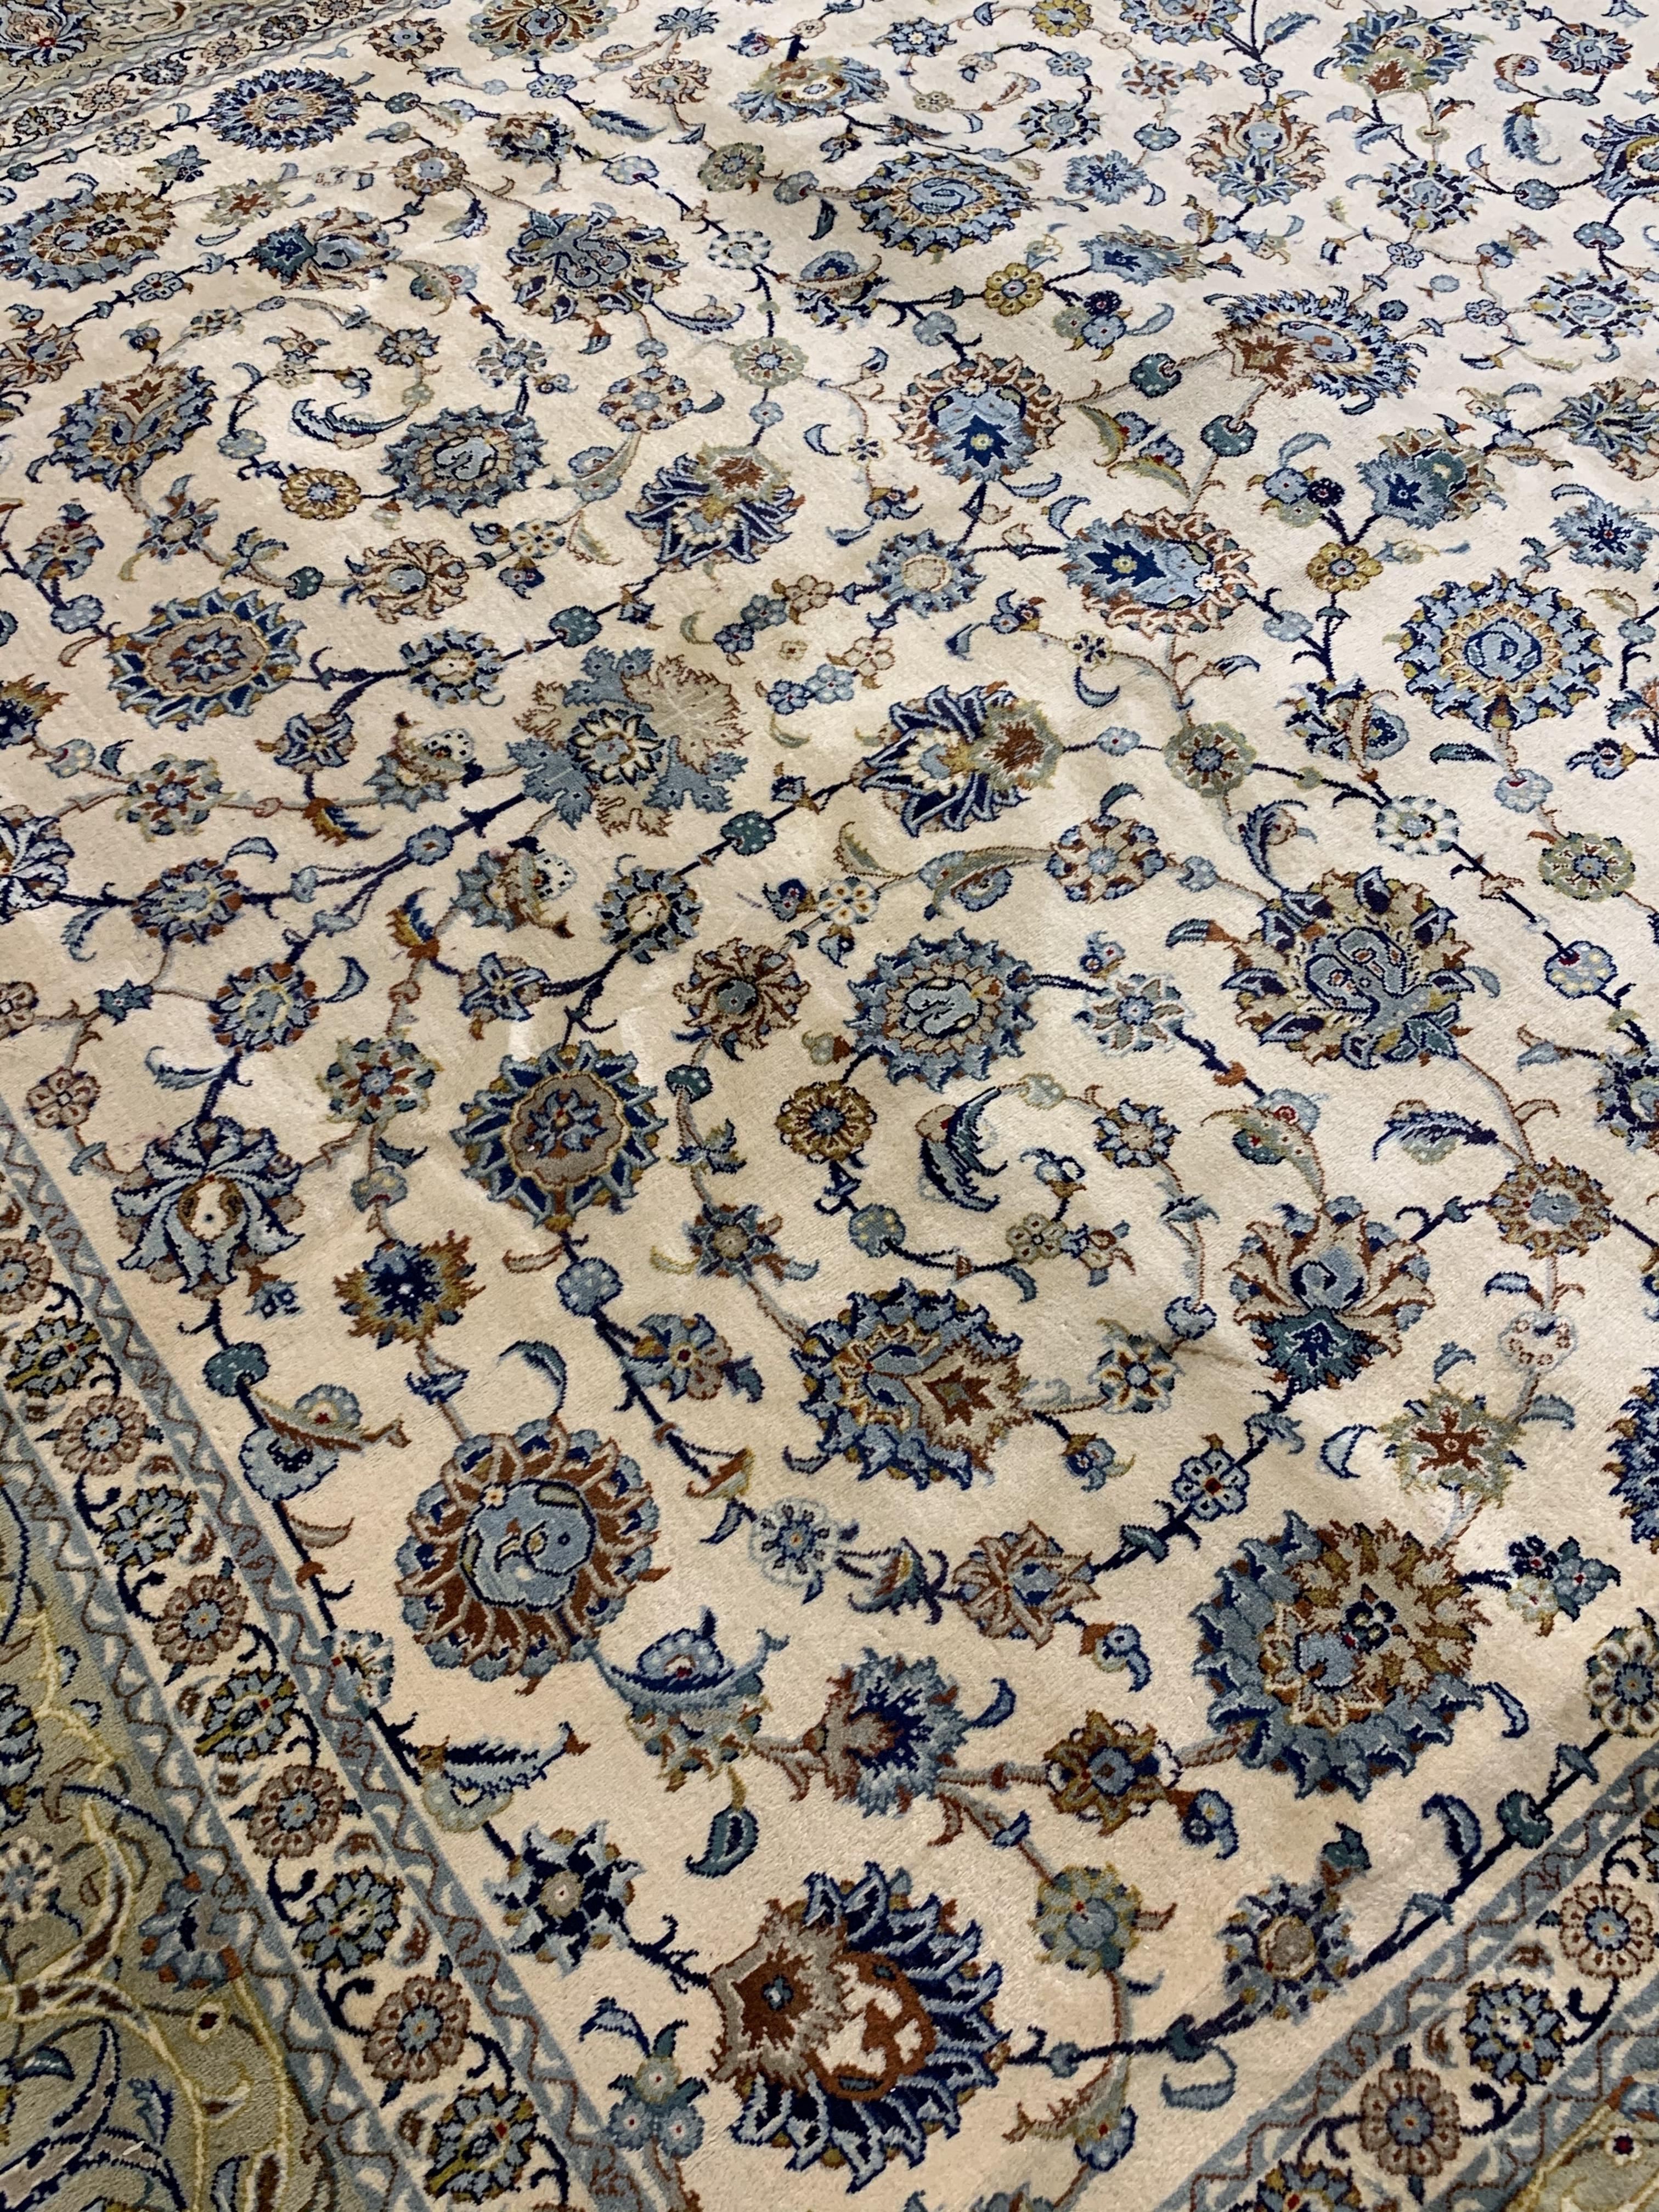 Large Persian Kashan carpet, ivory ground with interlacing foliage, decorated with stylised flower - Image 5 of 5